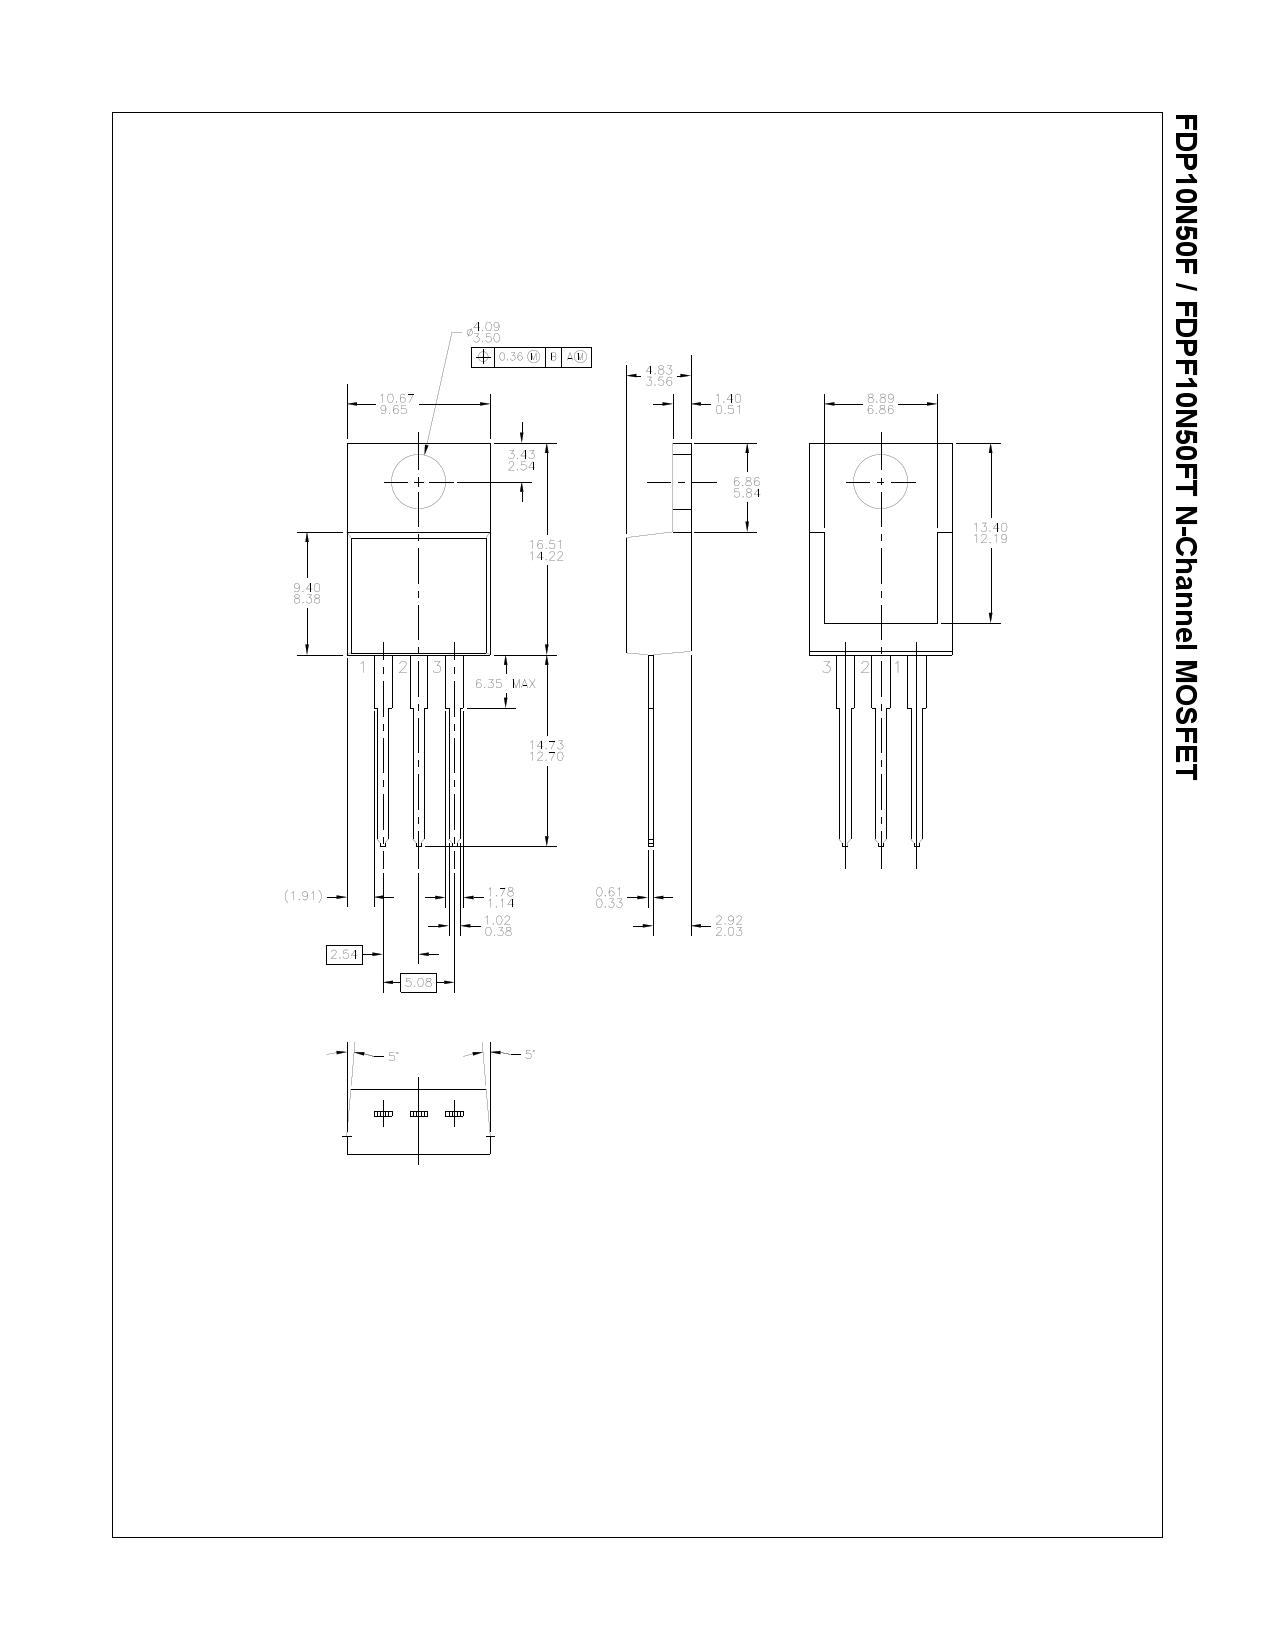 FDPF10N50FT 전자부품, 판매, 대치품